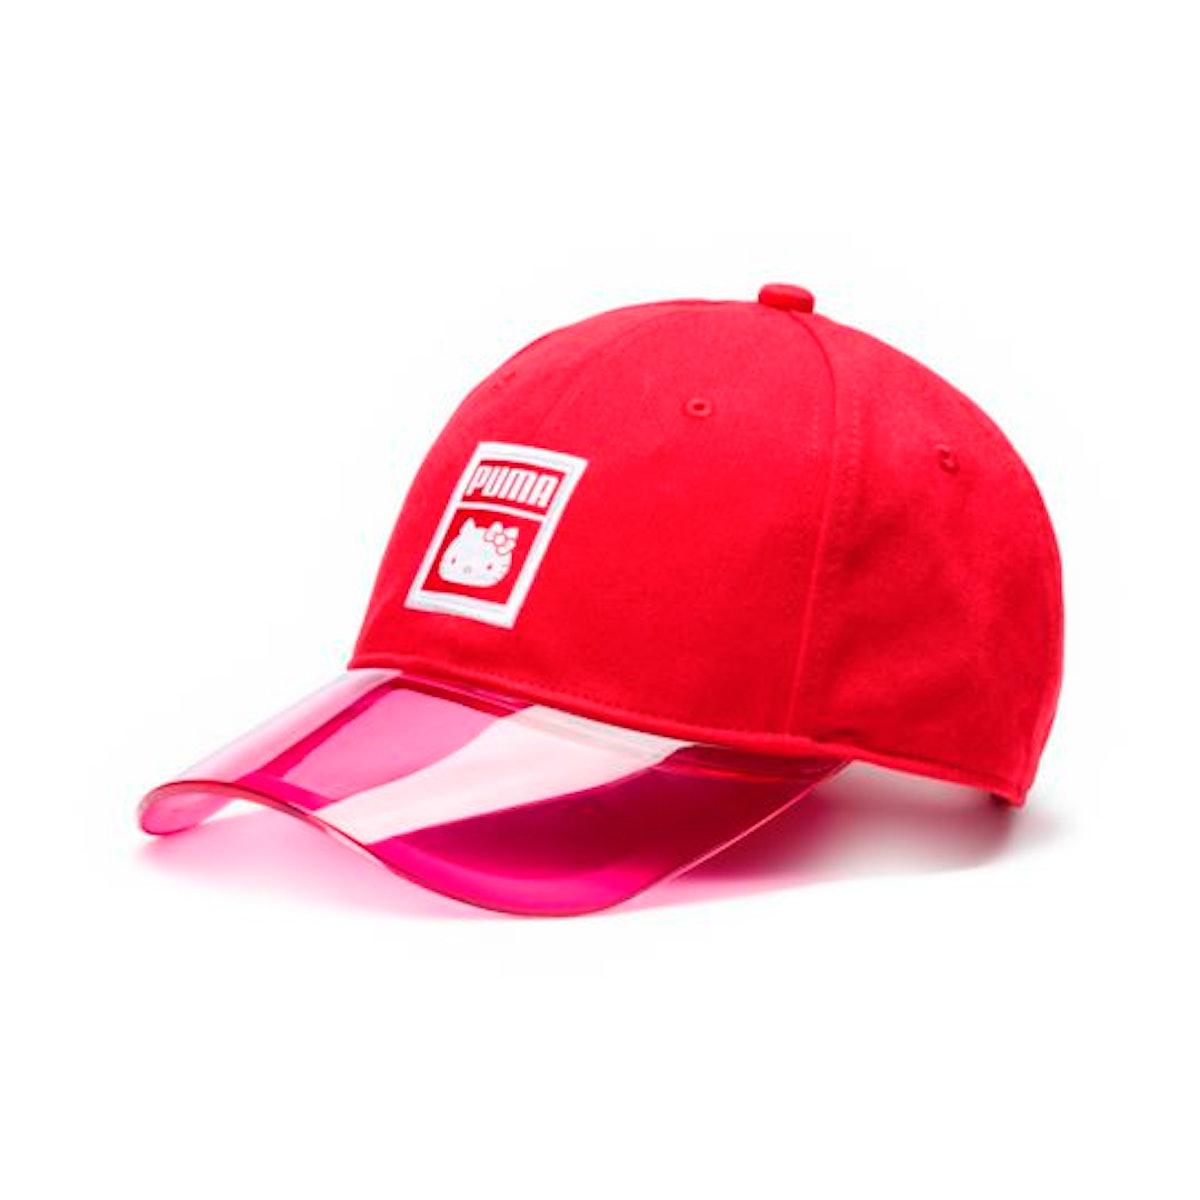 Puma X Hello Kitty Hat